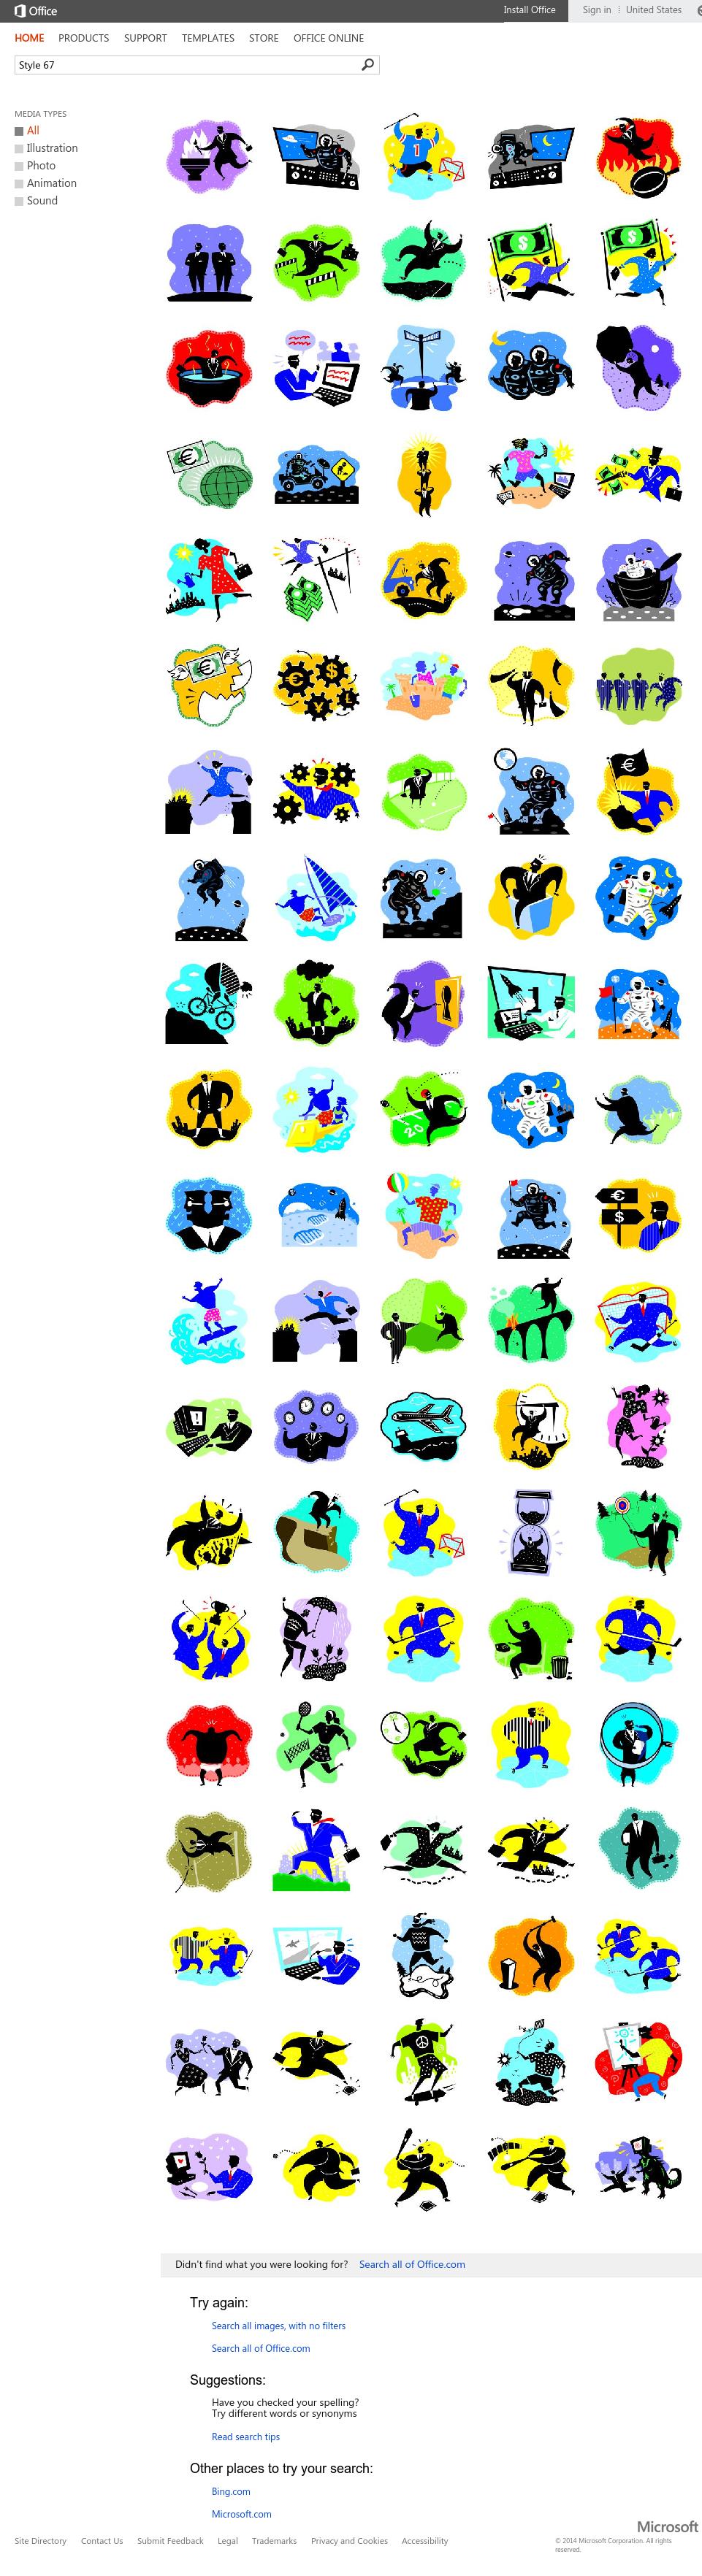 Microsoft Clip Art.